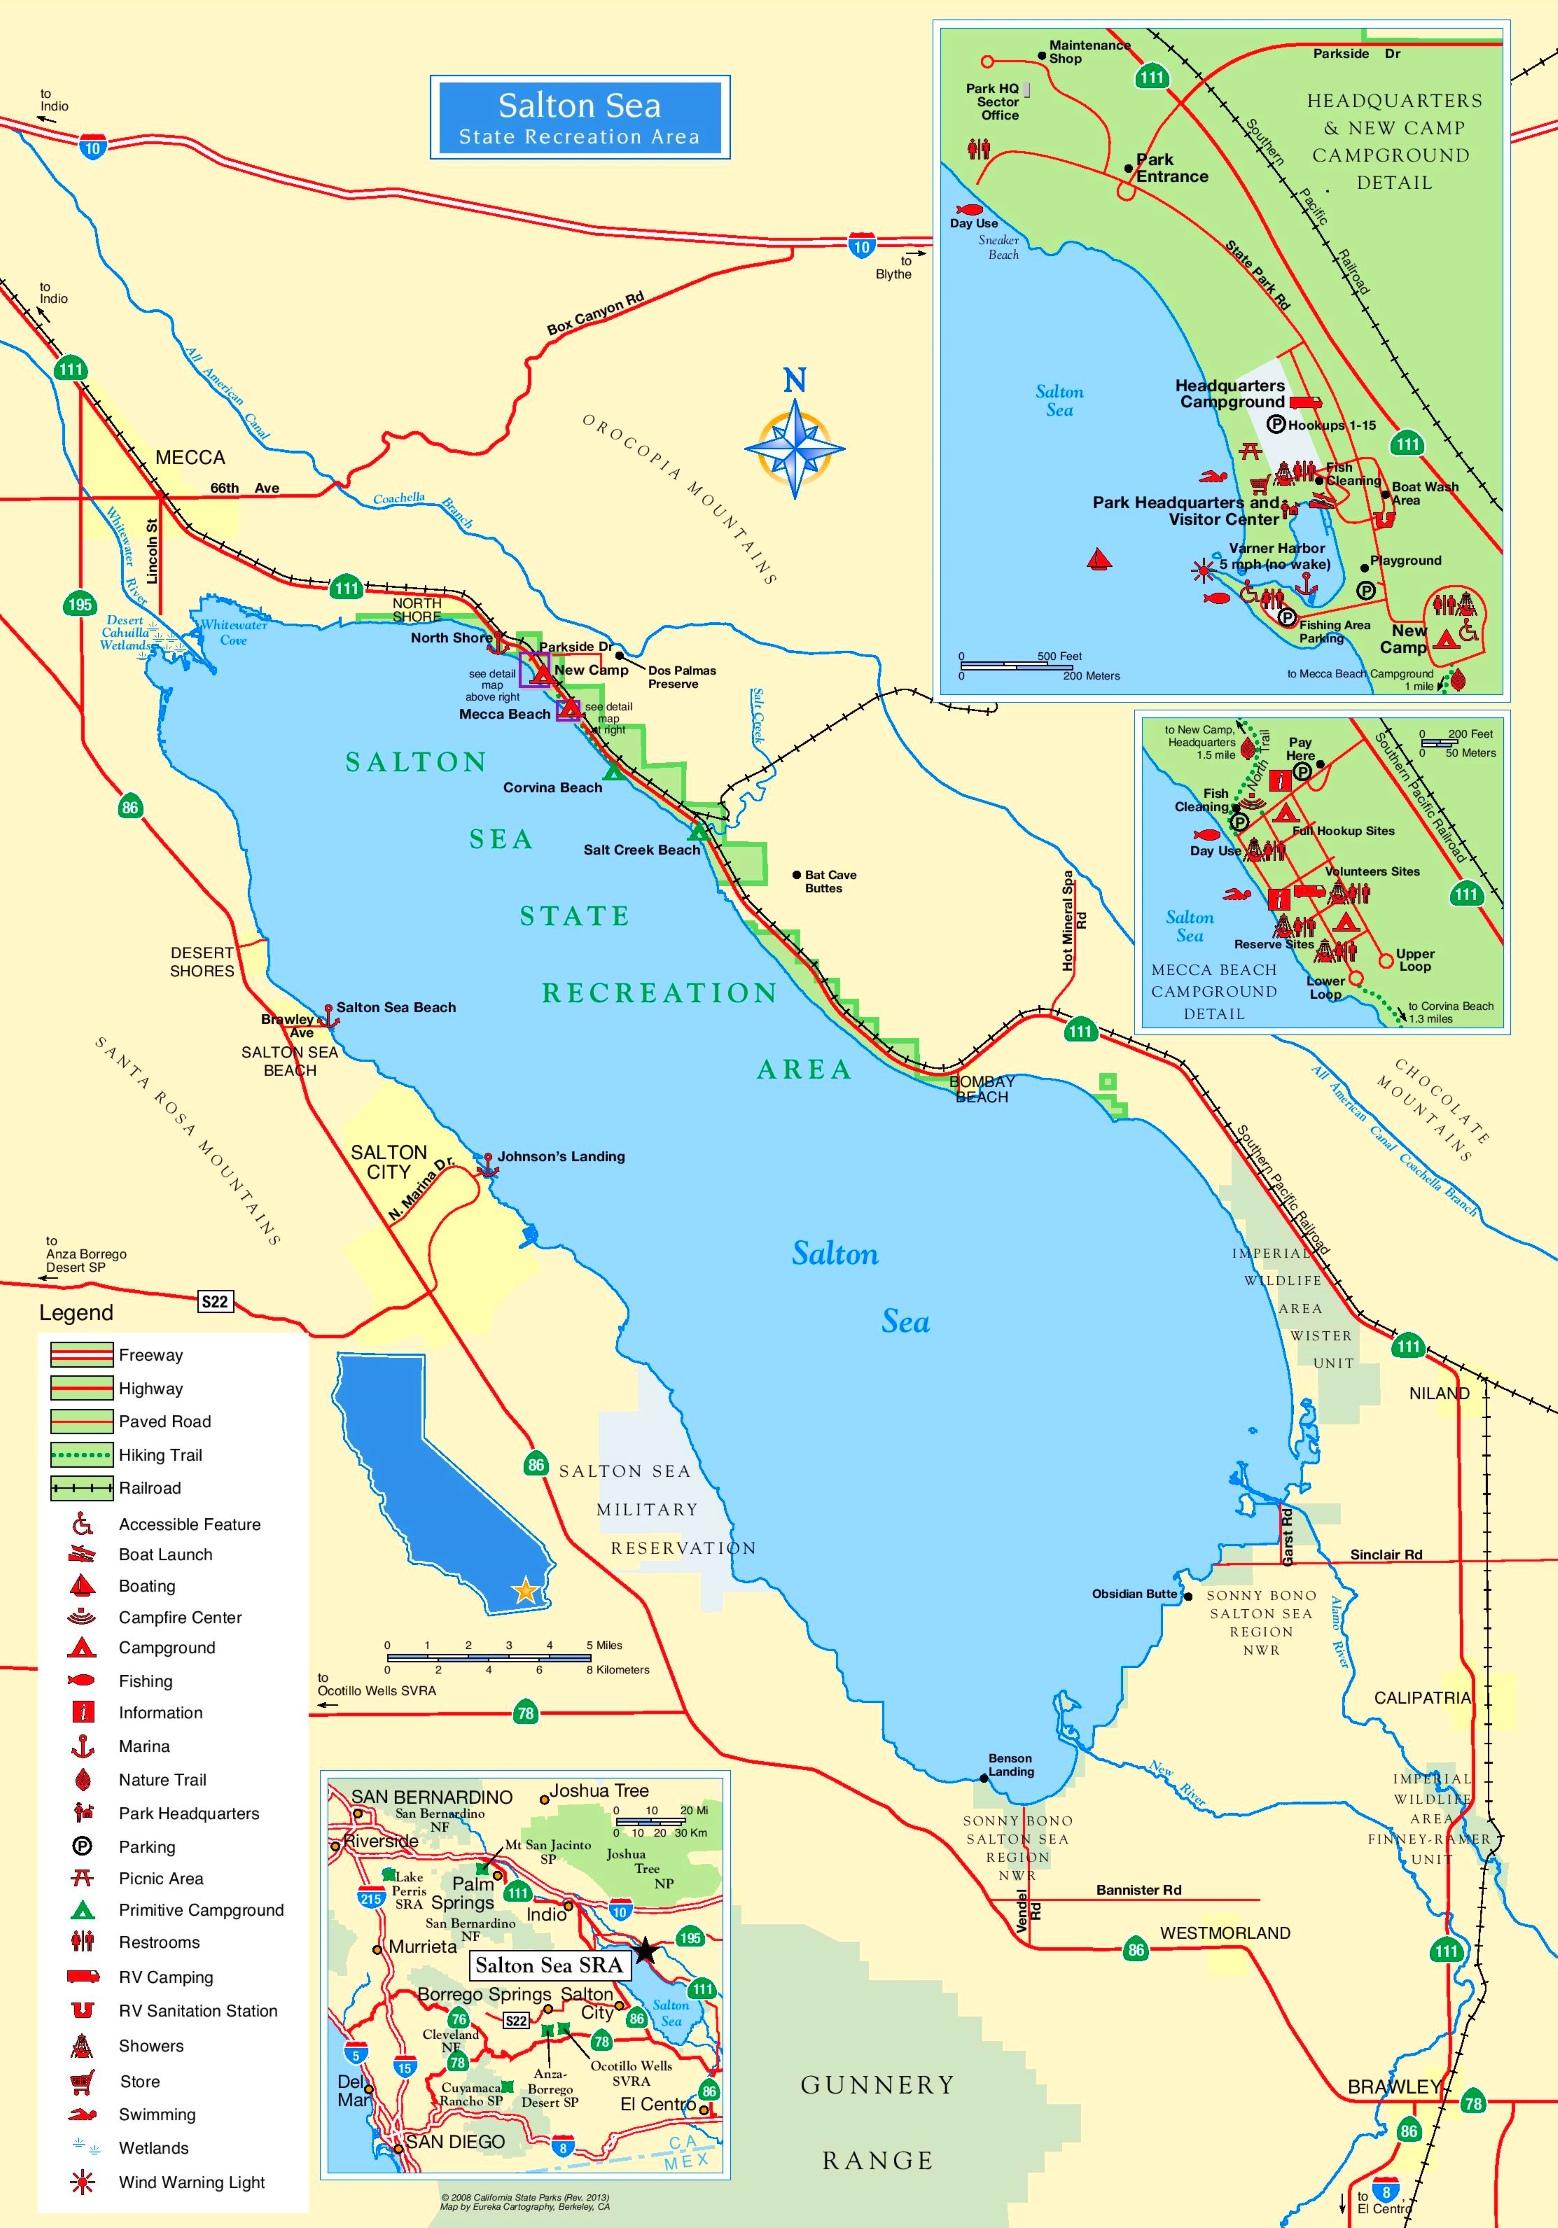 Salton Sea Map Large detailed tourist map of Salton Sea